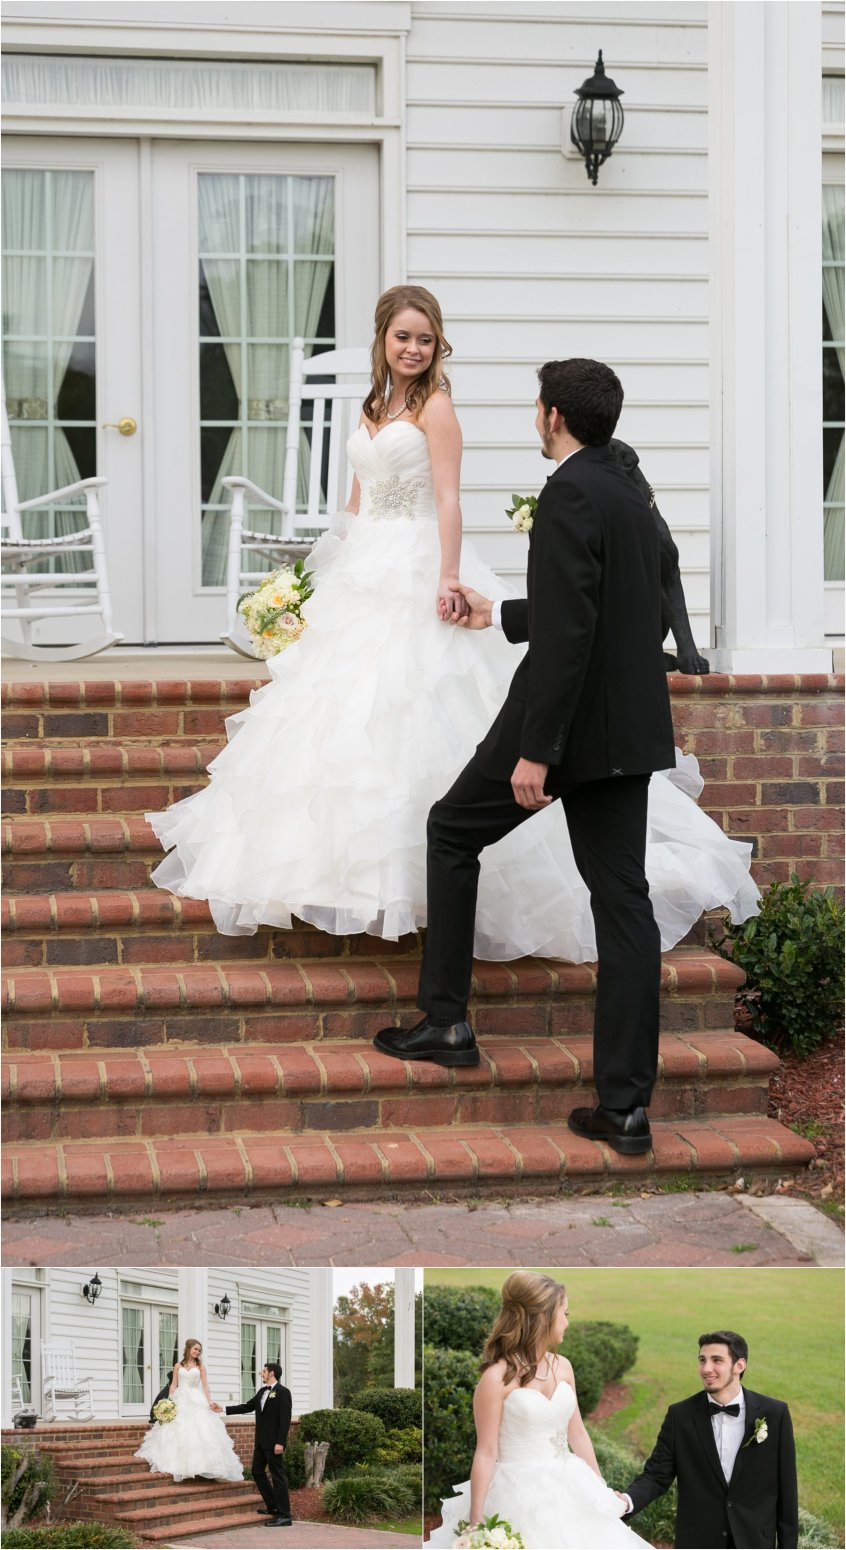 Holly_Ridge_Manor_Wedding_Photography_Jessica_Ryan_Photography_virginia_virginia_beach_0257